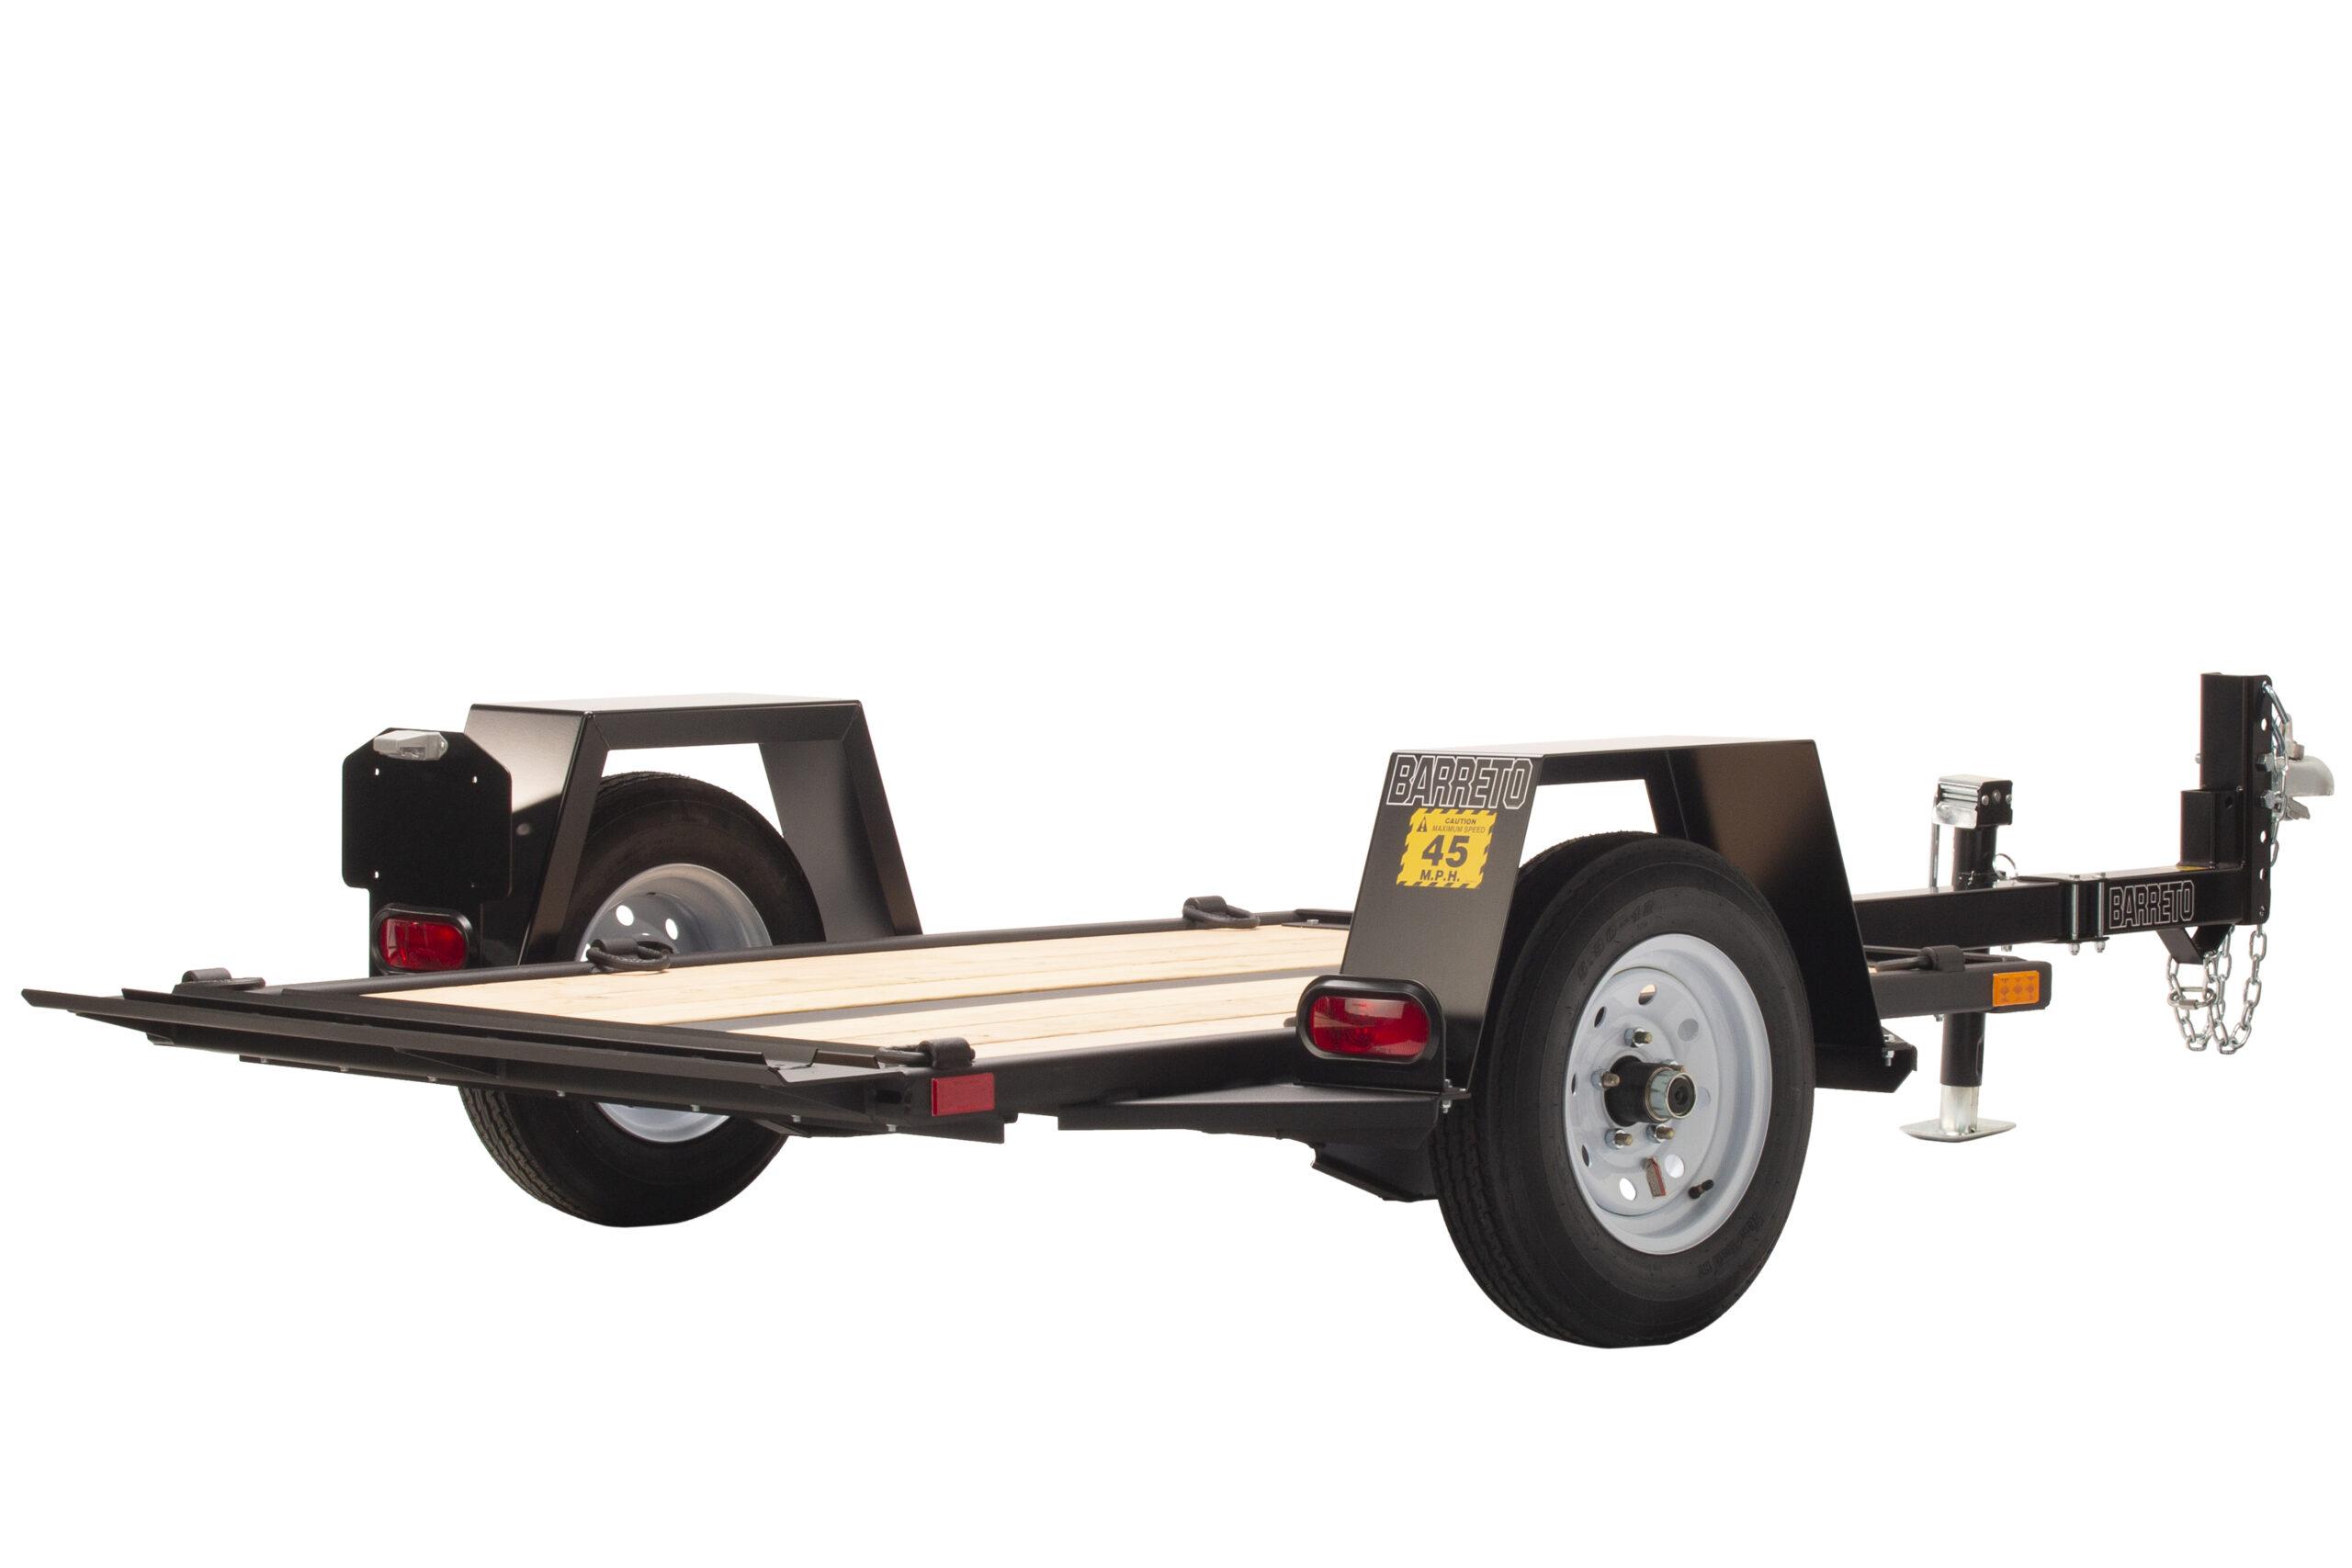 4x6TBT Utility trailer69